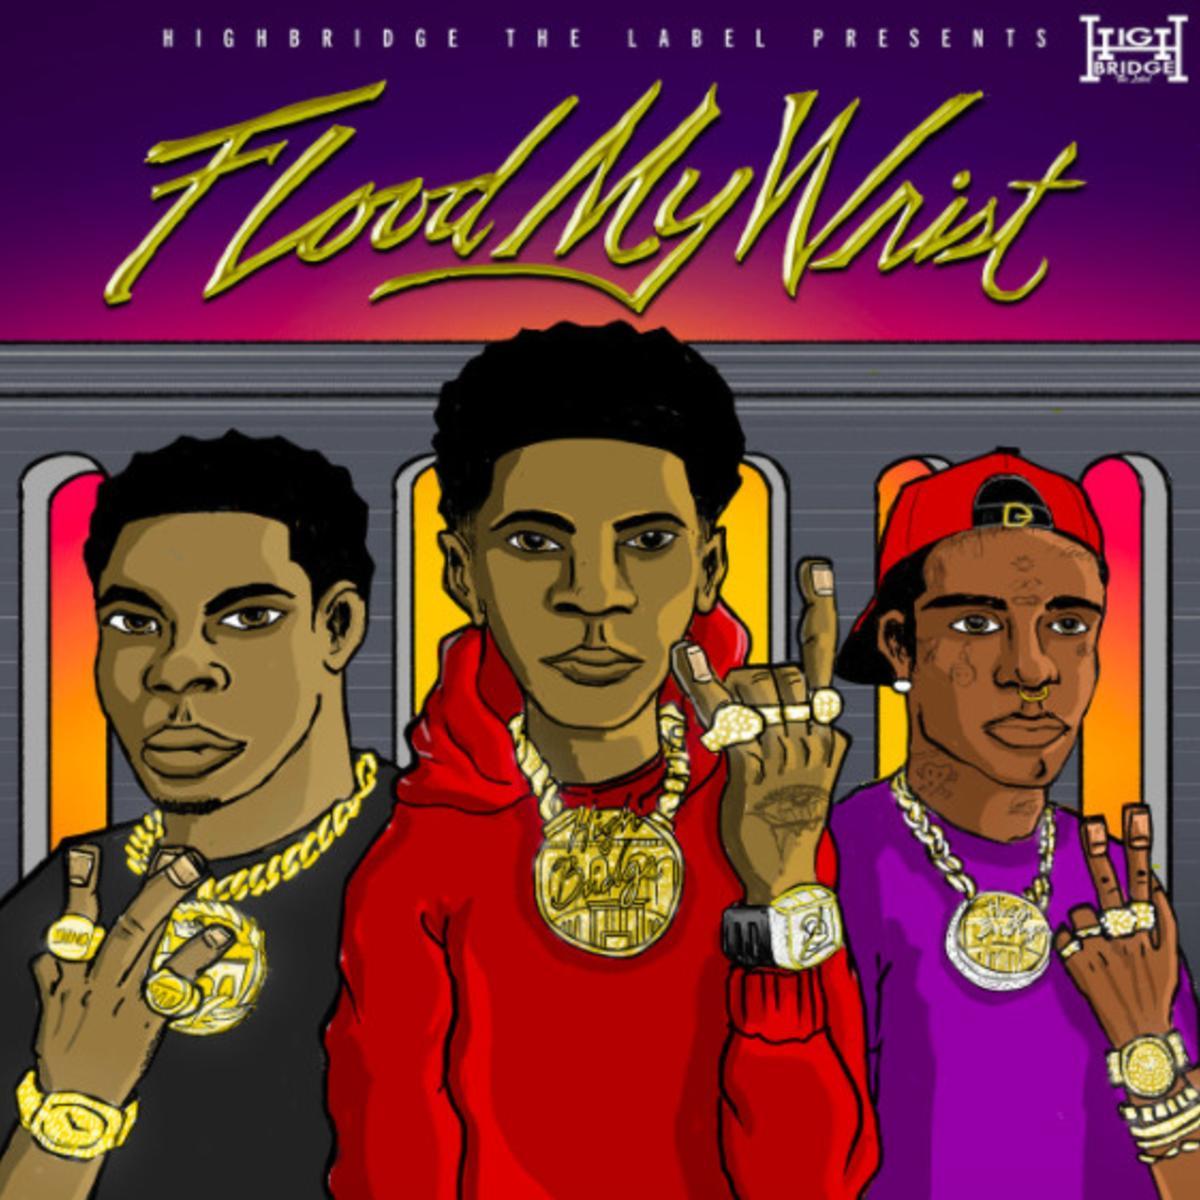 A Boogie Wit Da Hoodie & Don Q - Flood My Wrist Ft Lil Uzi Vert